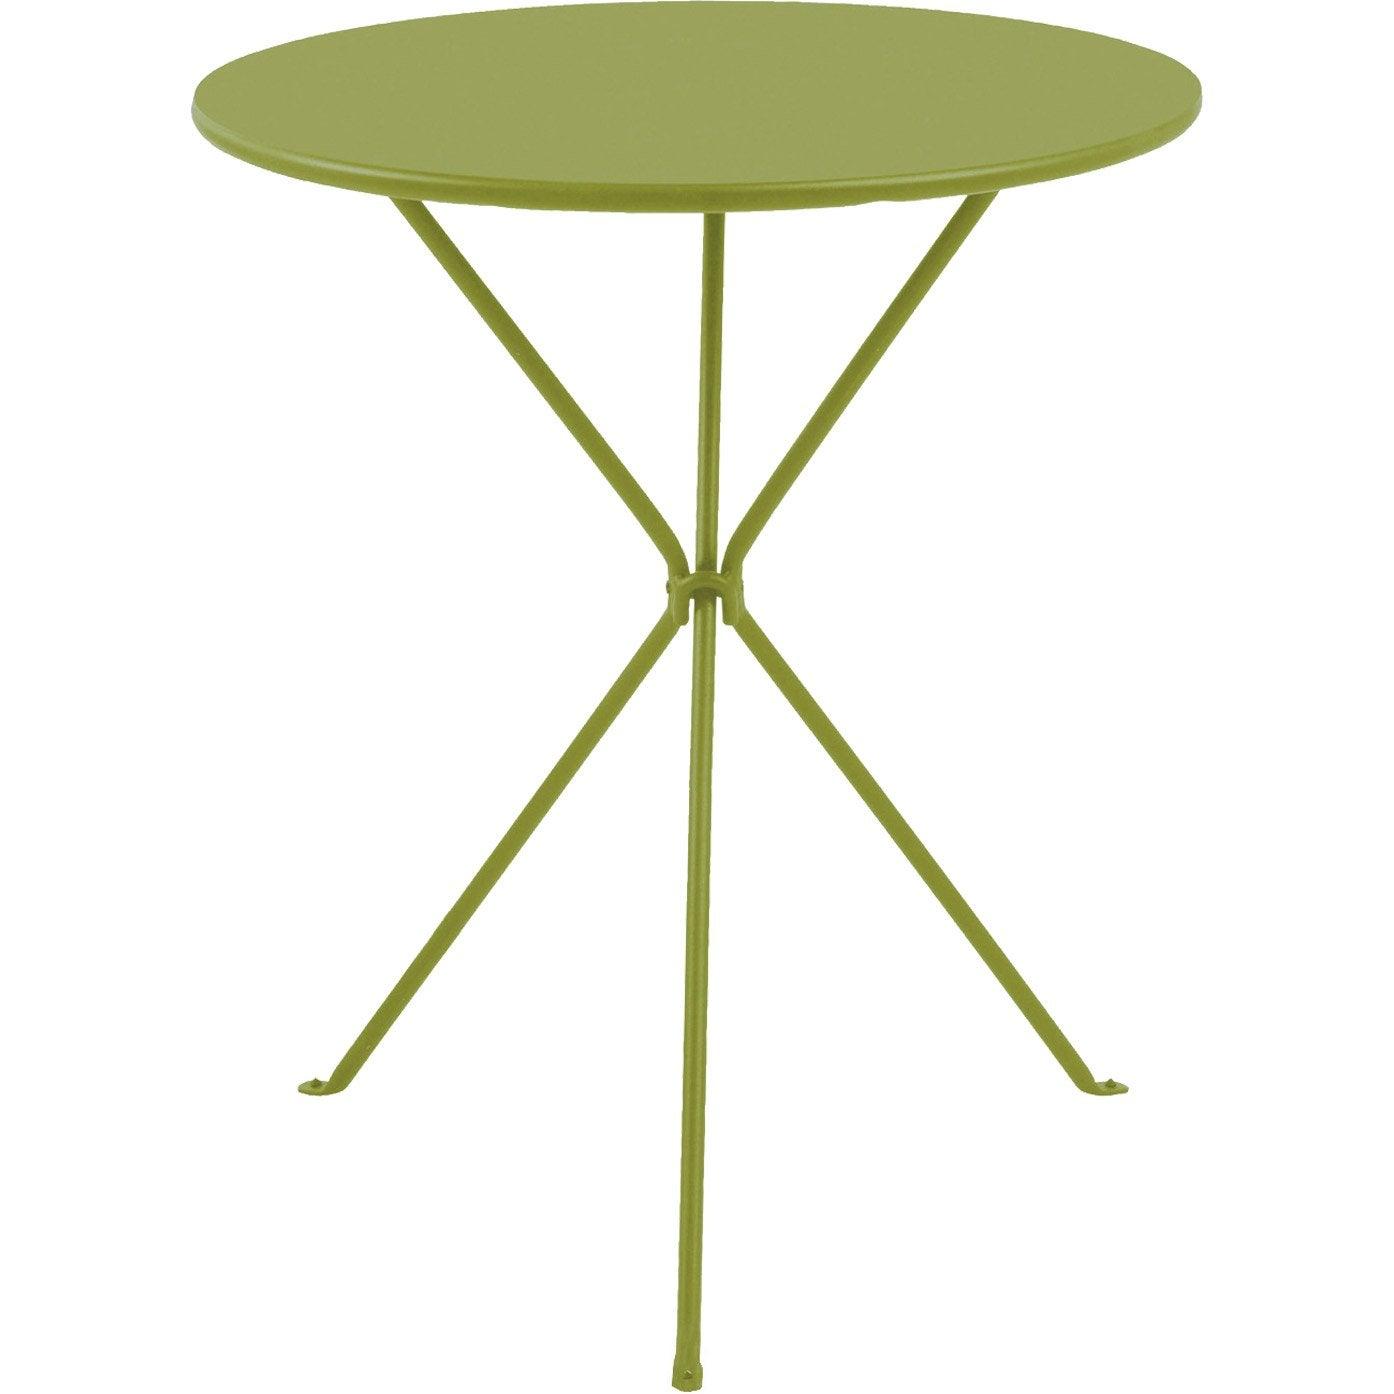 Table basse gu ridon ronde vert 2 personnes leroy merlin - Table basse exterieur leroy merlin ...